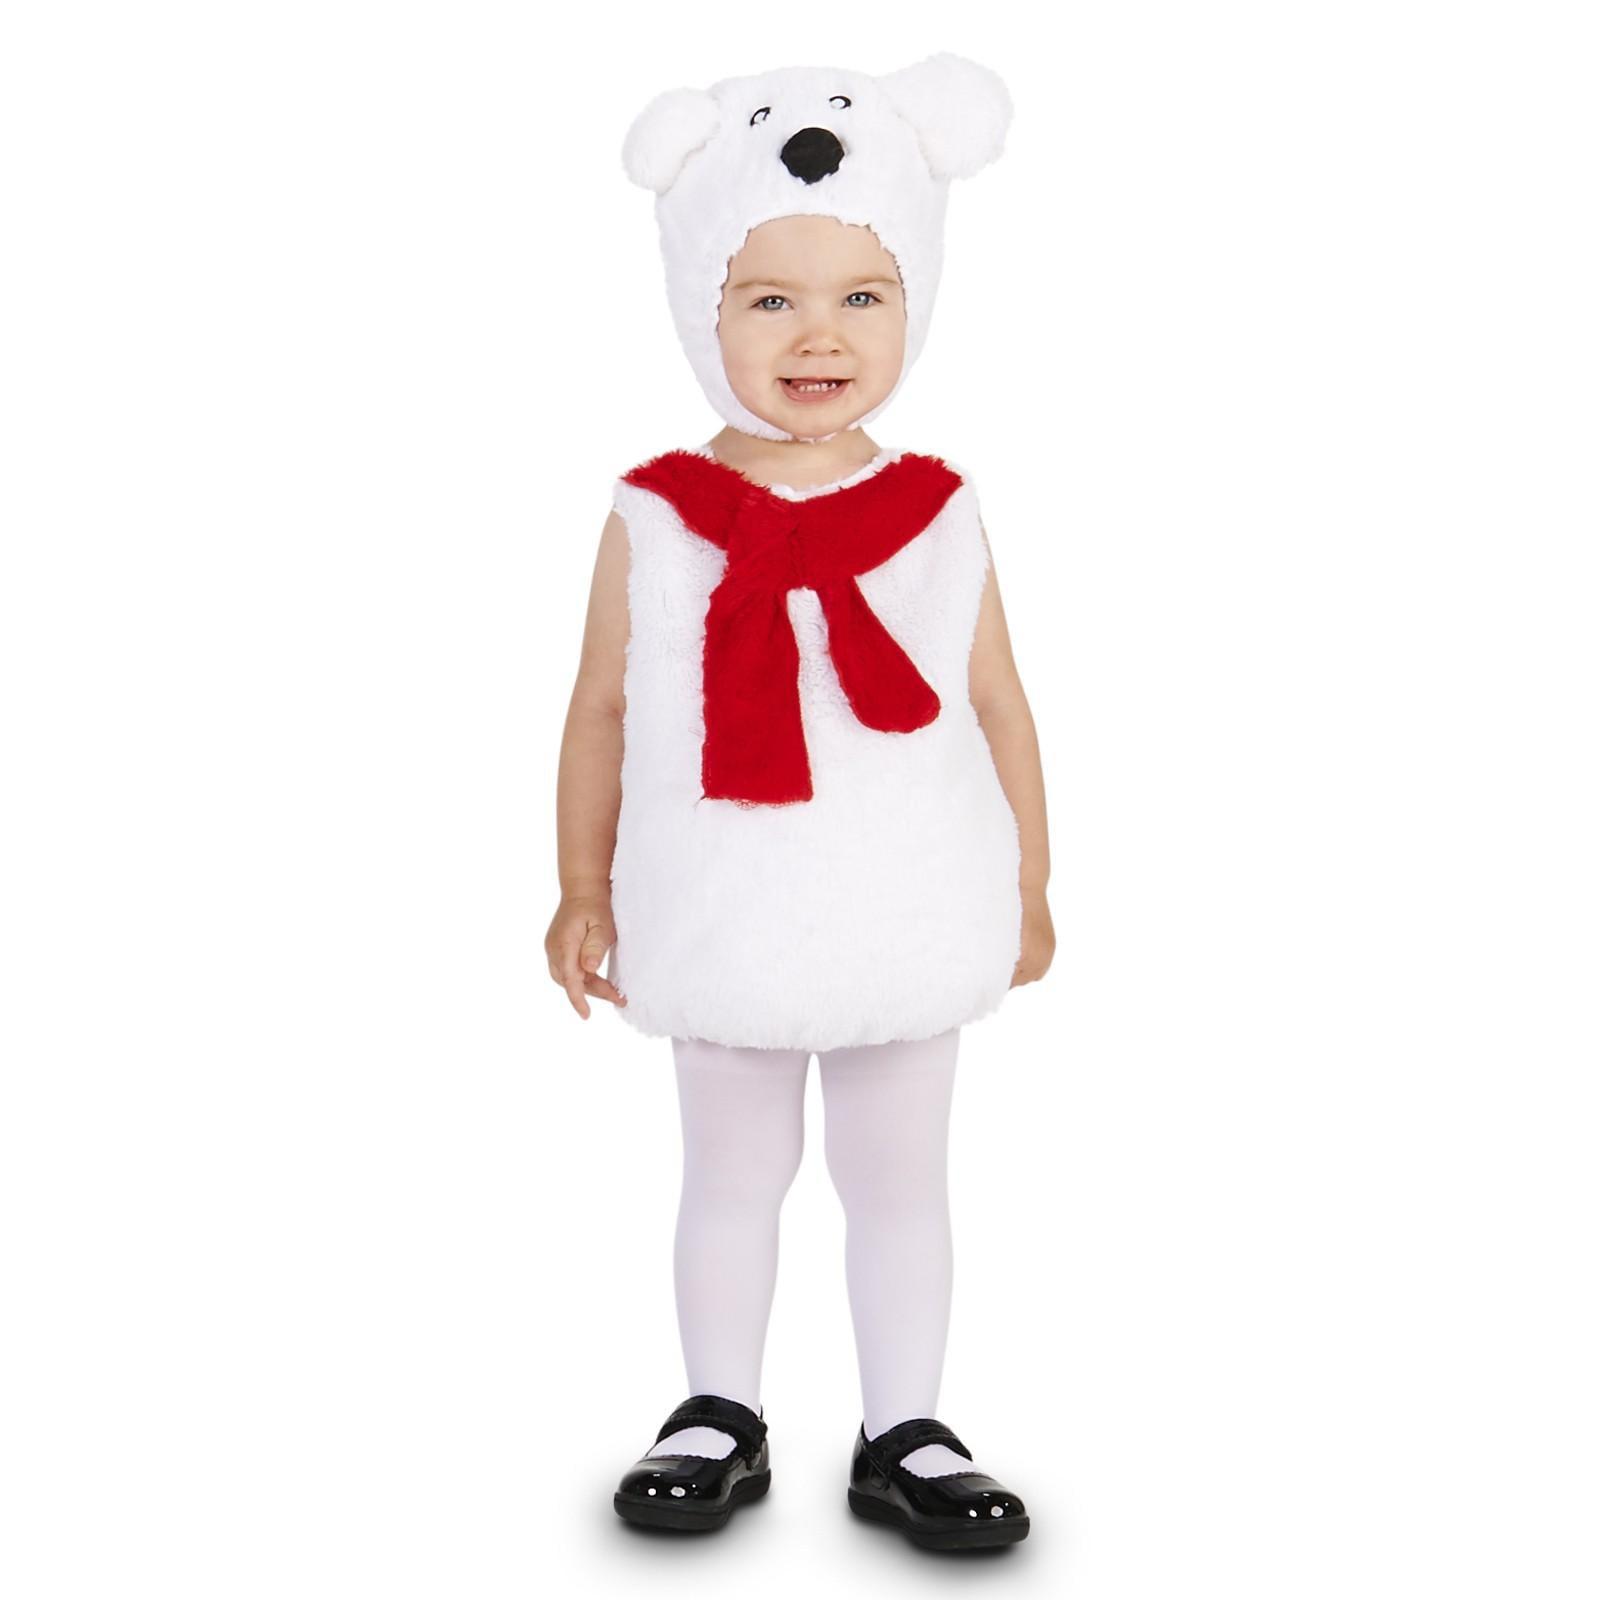 sc 1 st  Walmart & Cozy Polar Bear Costume - Walmart.com